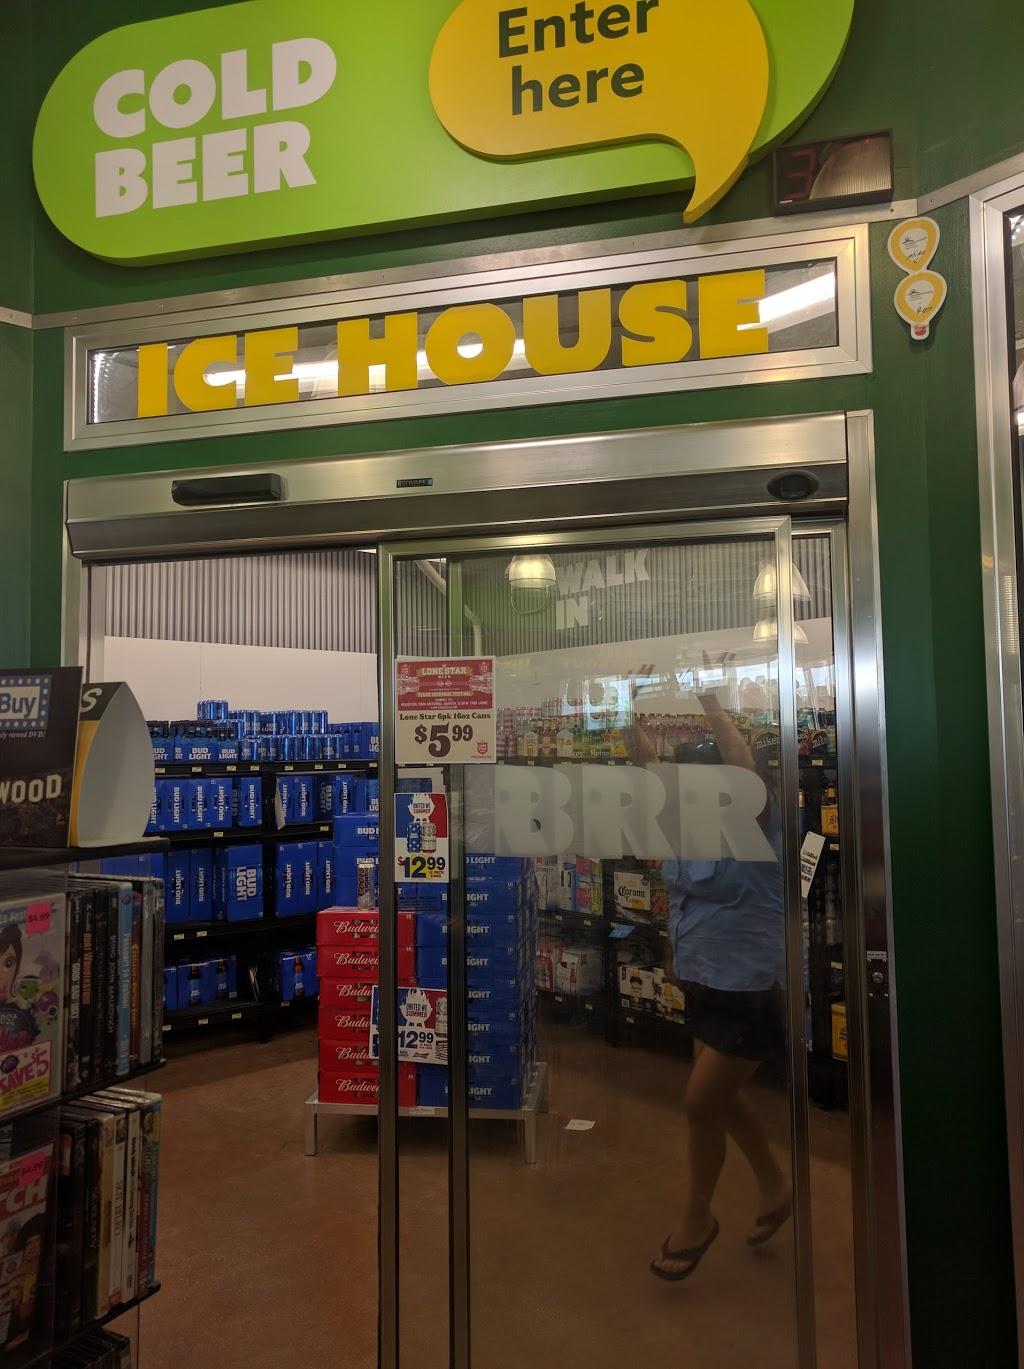 Circle K - cafe  | Photo 2 of 6 | Address: 9350 S East Loop 410, San Antonio, TX 78223, USA | Phone: (210) 633-9624